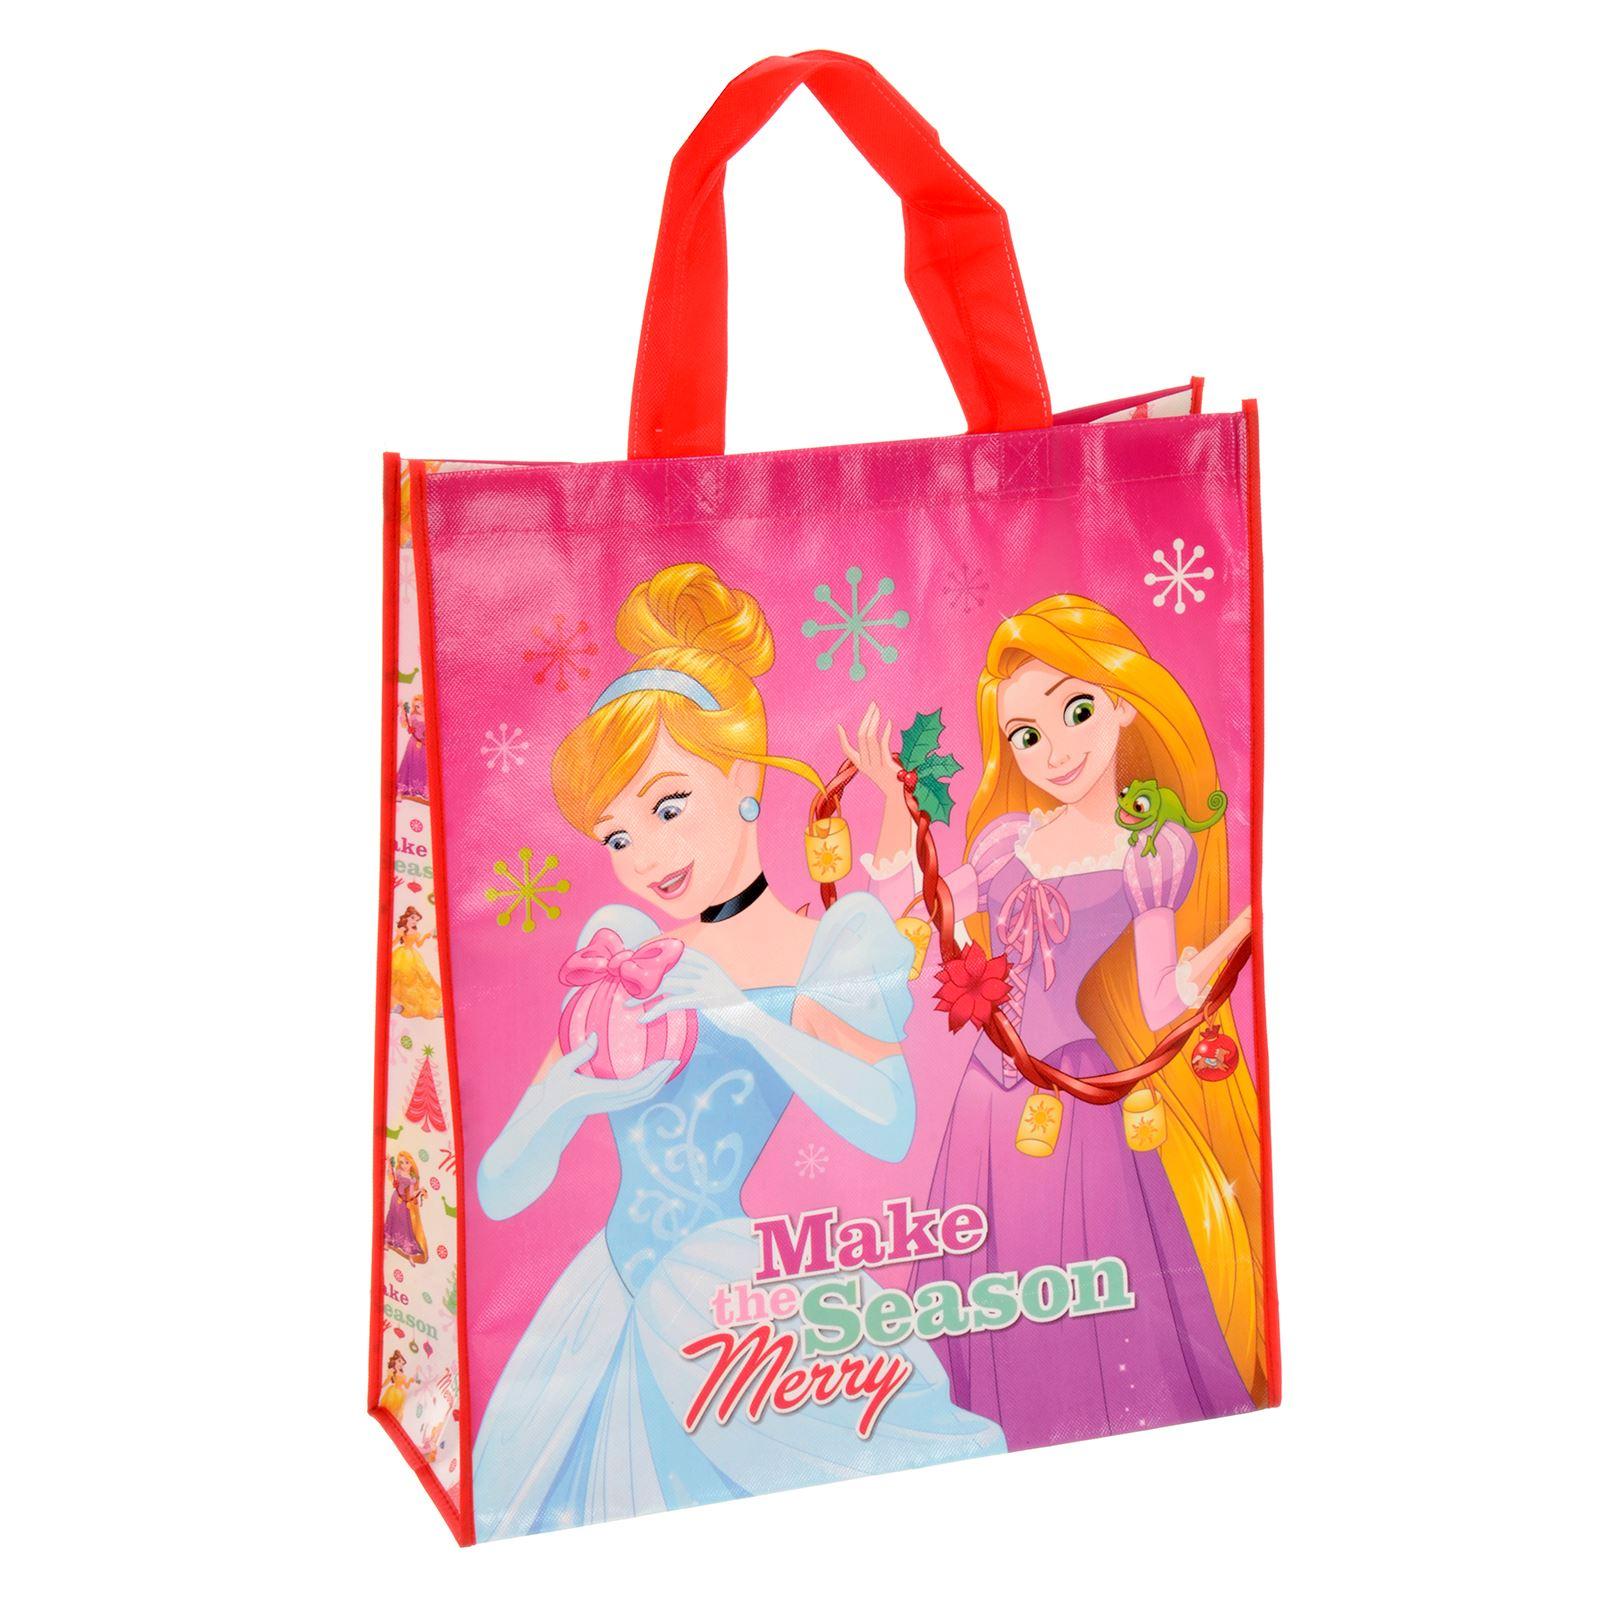 Giant Reusable Shopper Christmas Gift Bag -Make The Season Merry ...